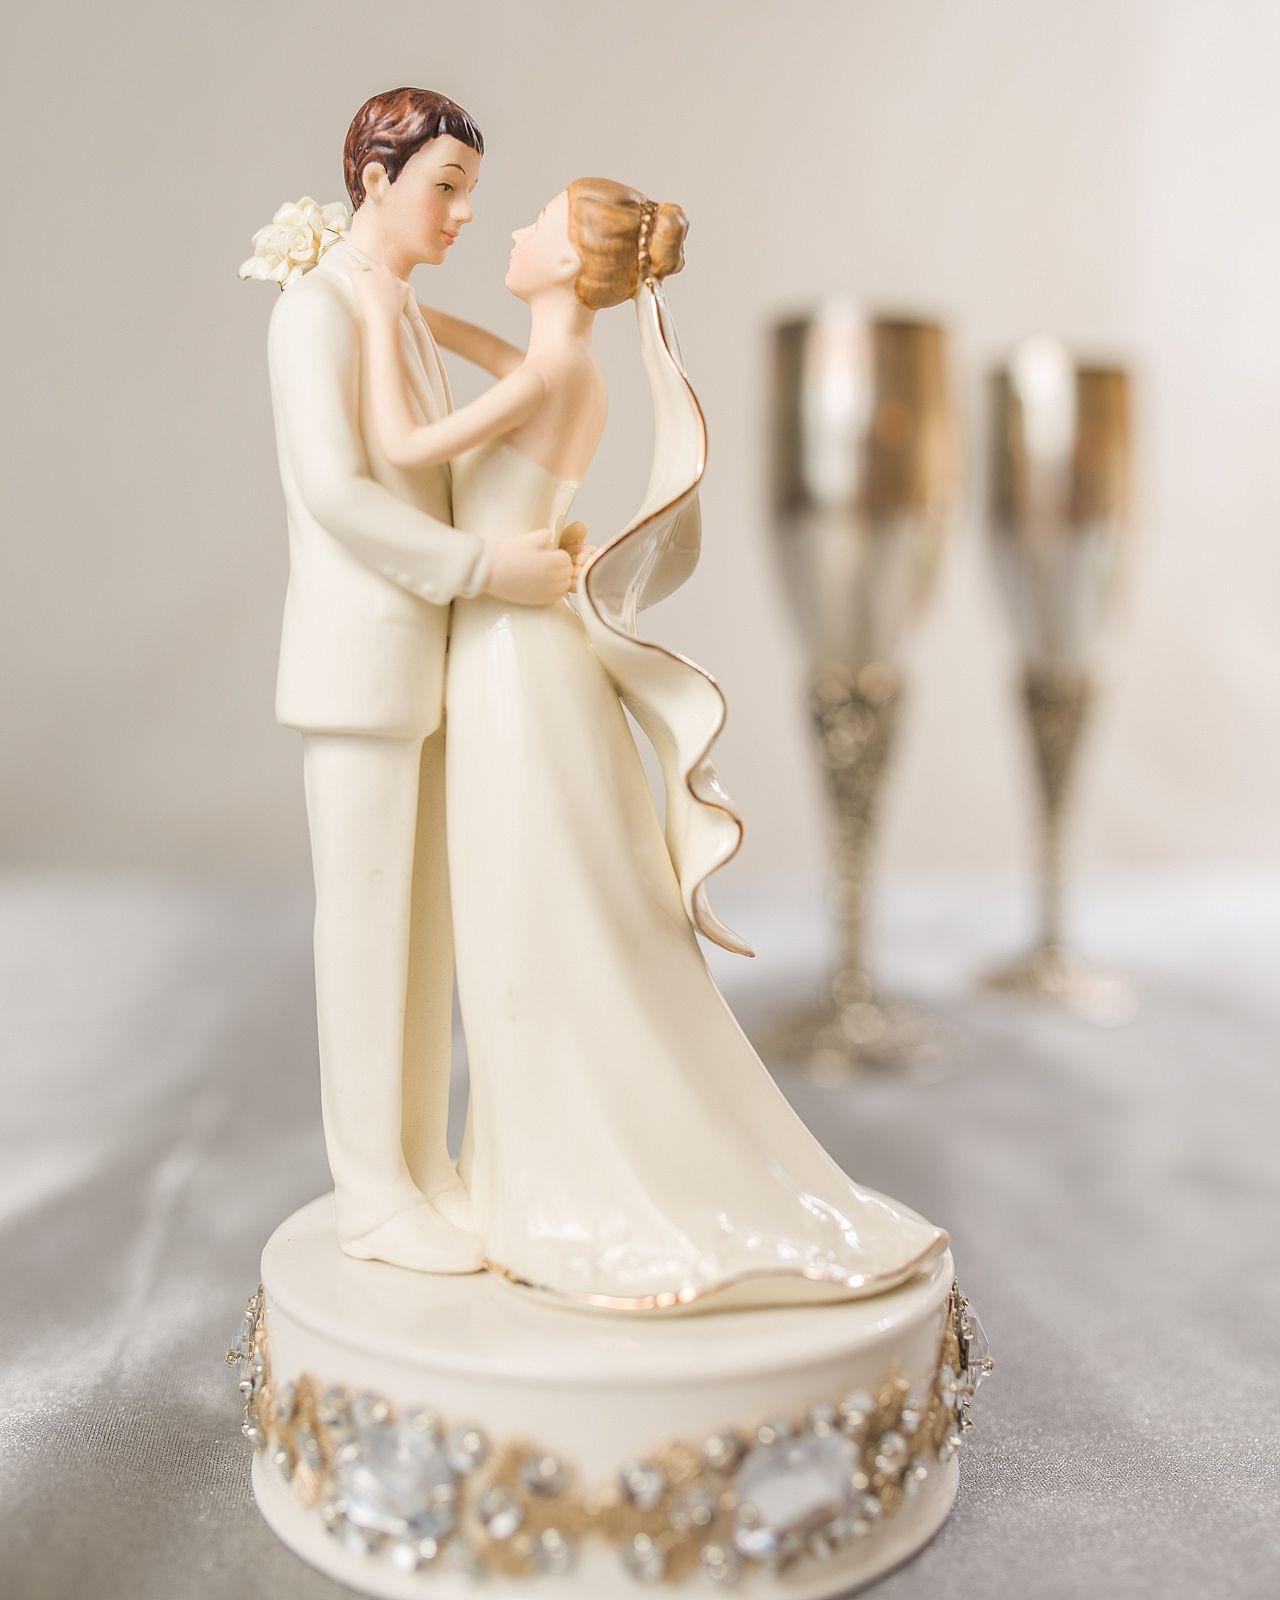 Black Groom White Bride Wedding Cake Toppers  Glam f White Porcelain Bride and Groom Wedding Cake